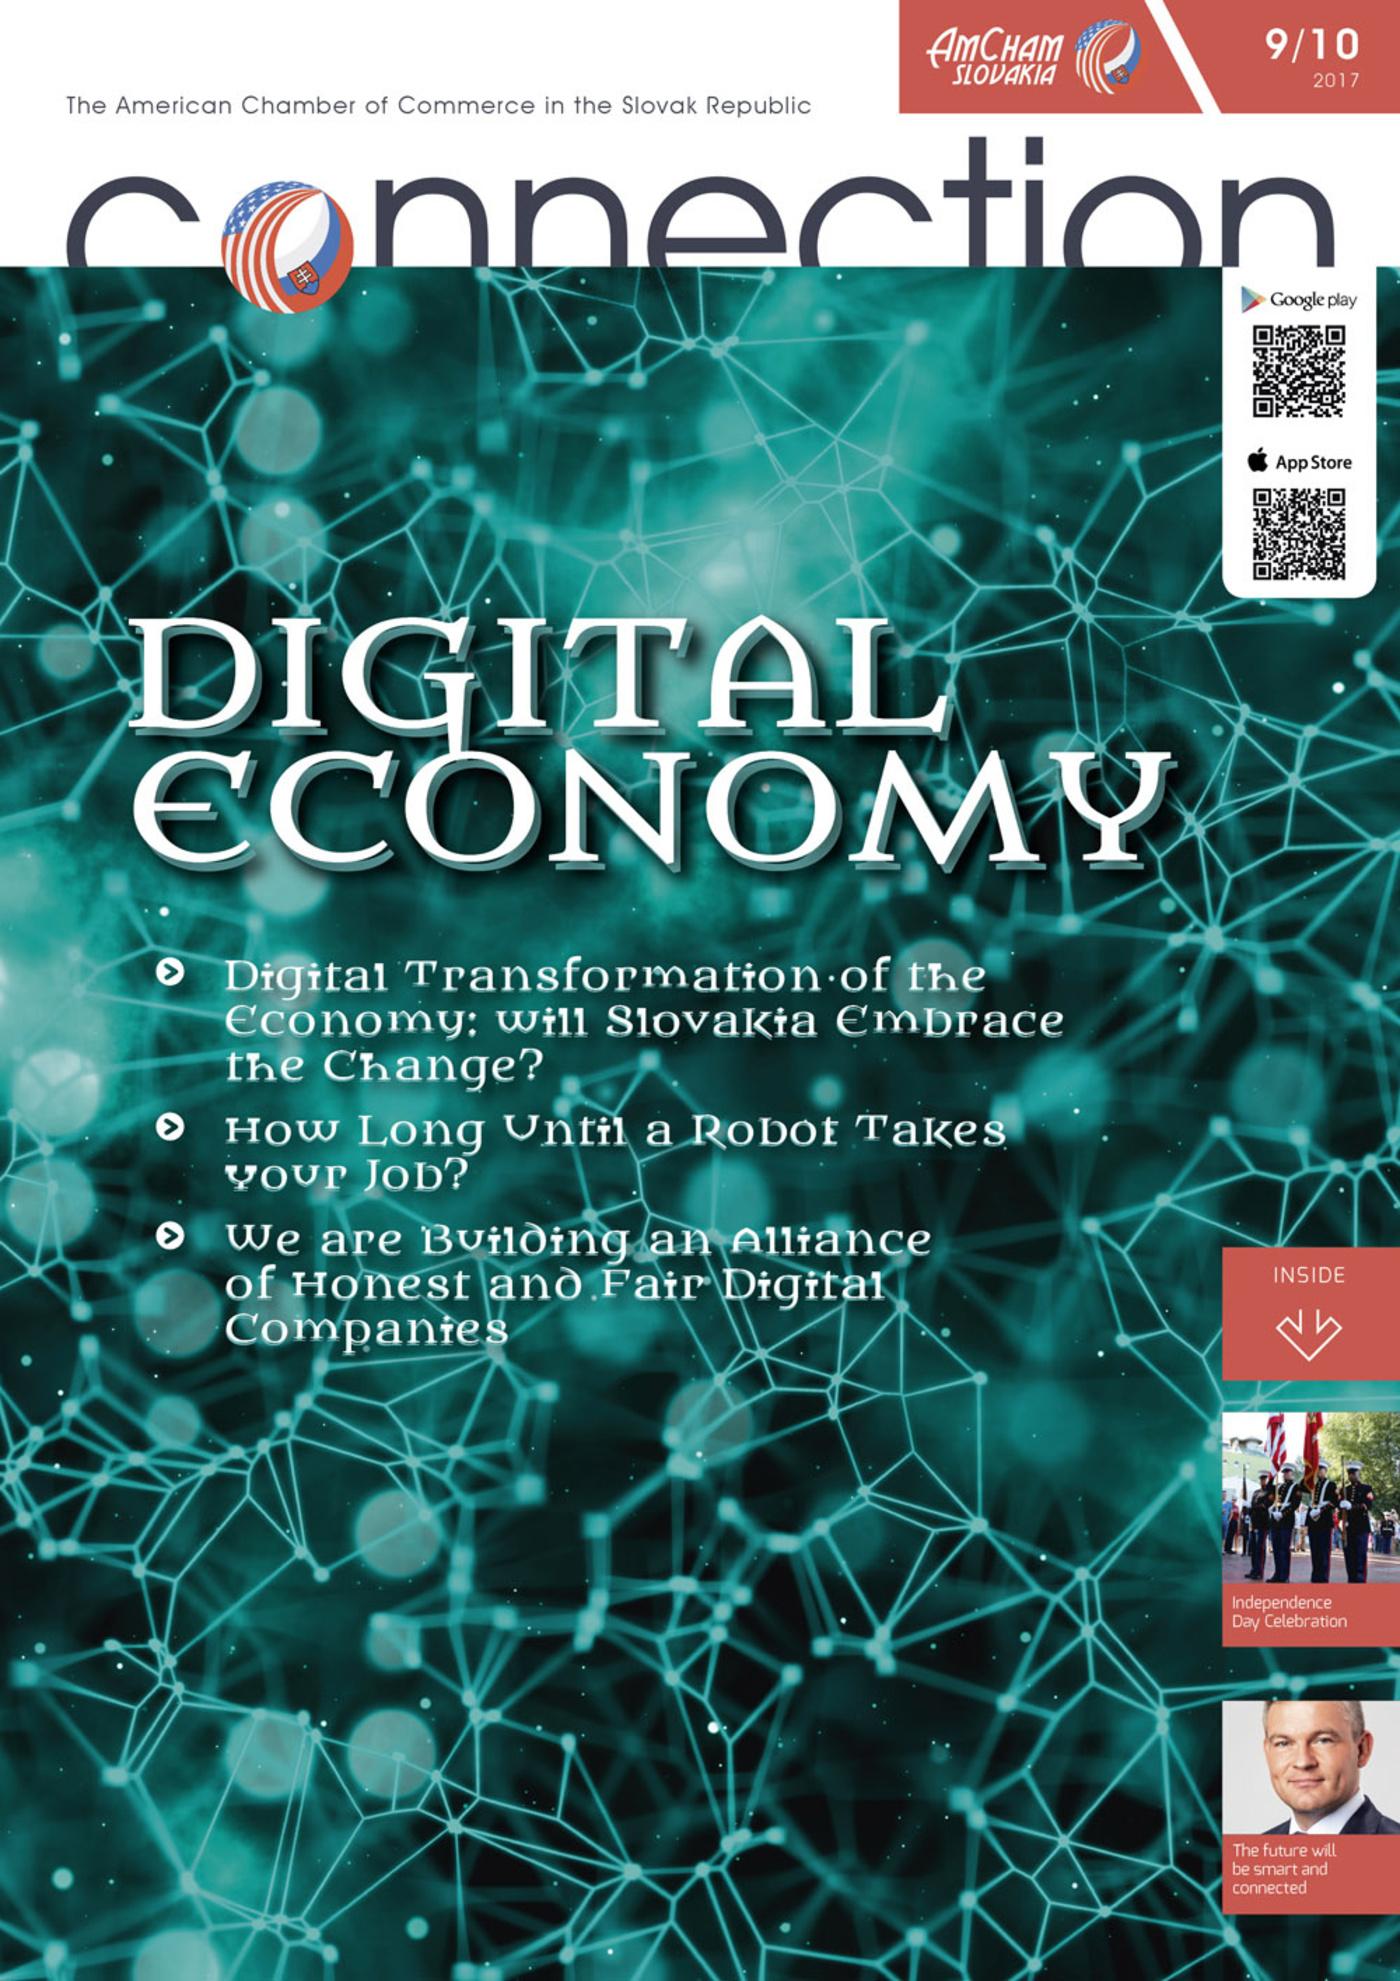 2017-05 / Digital Economy